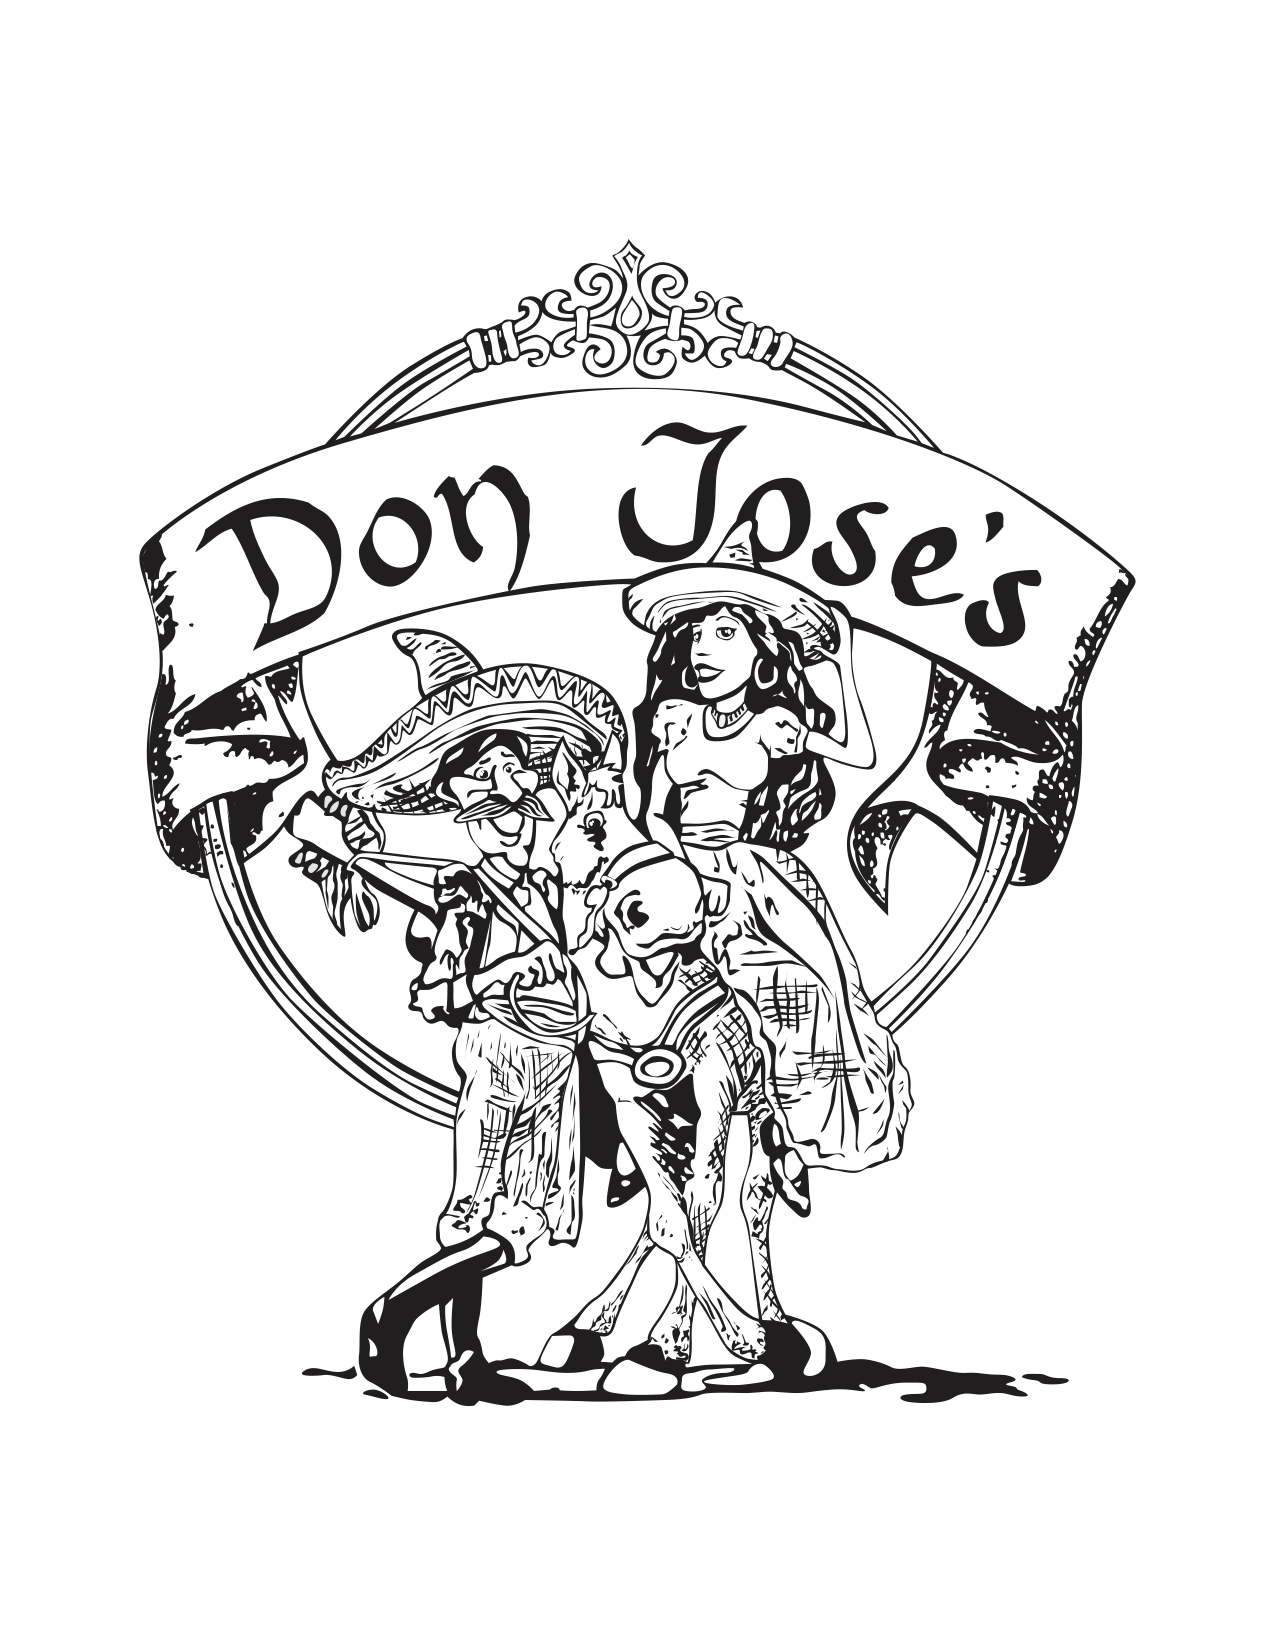 DonJose_BW.jpg